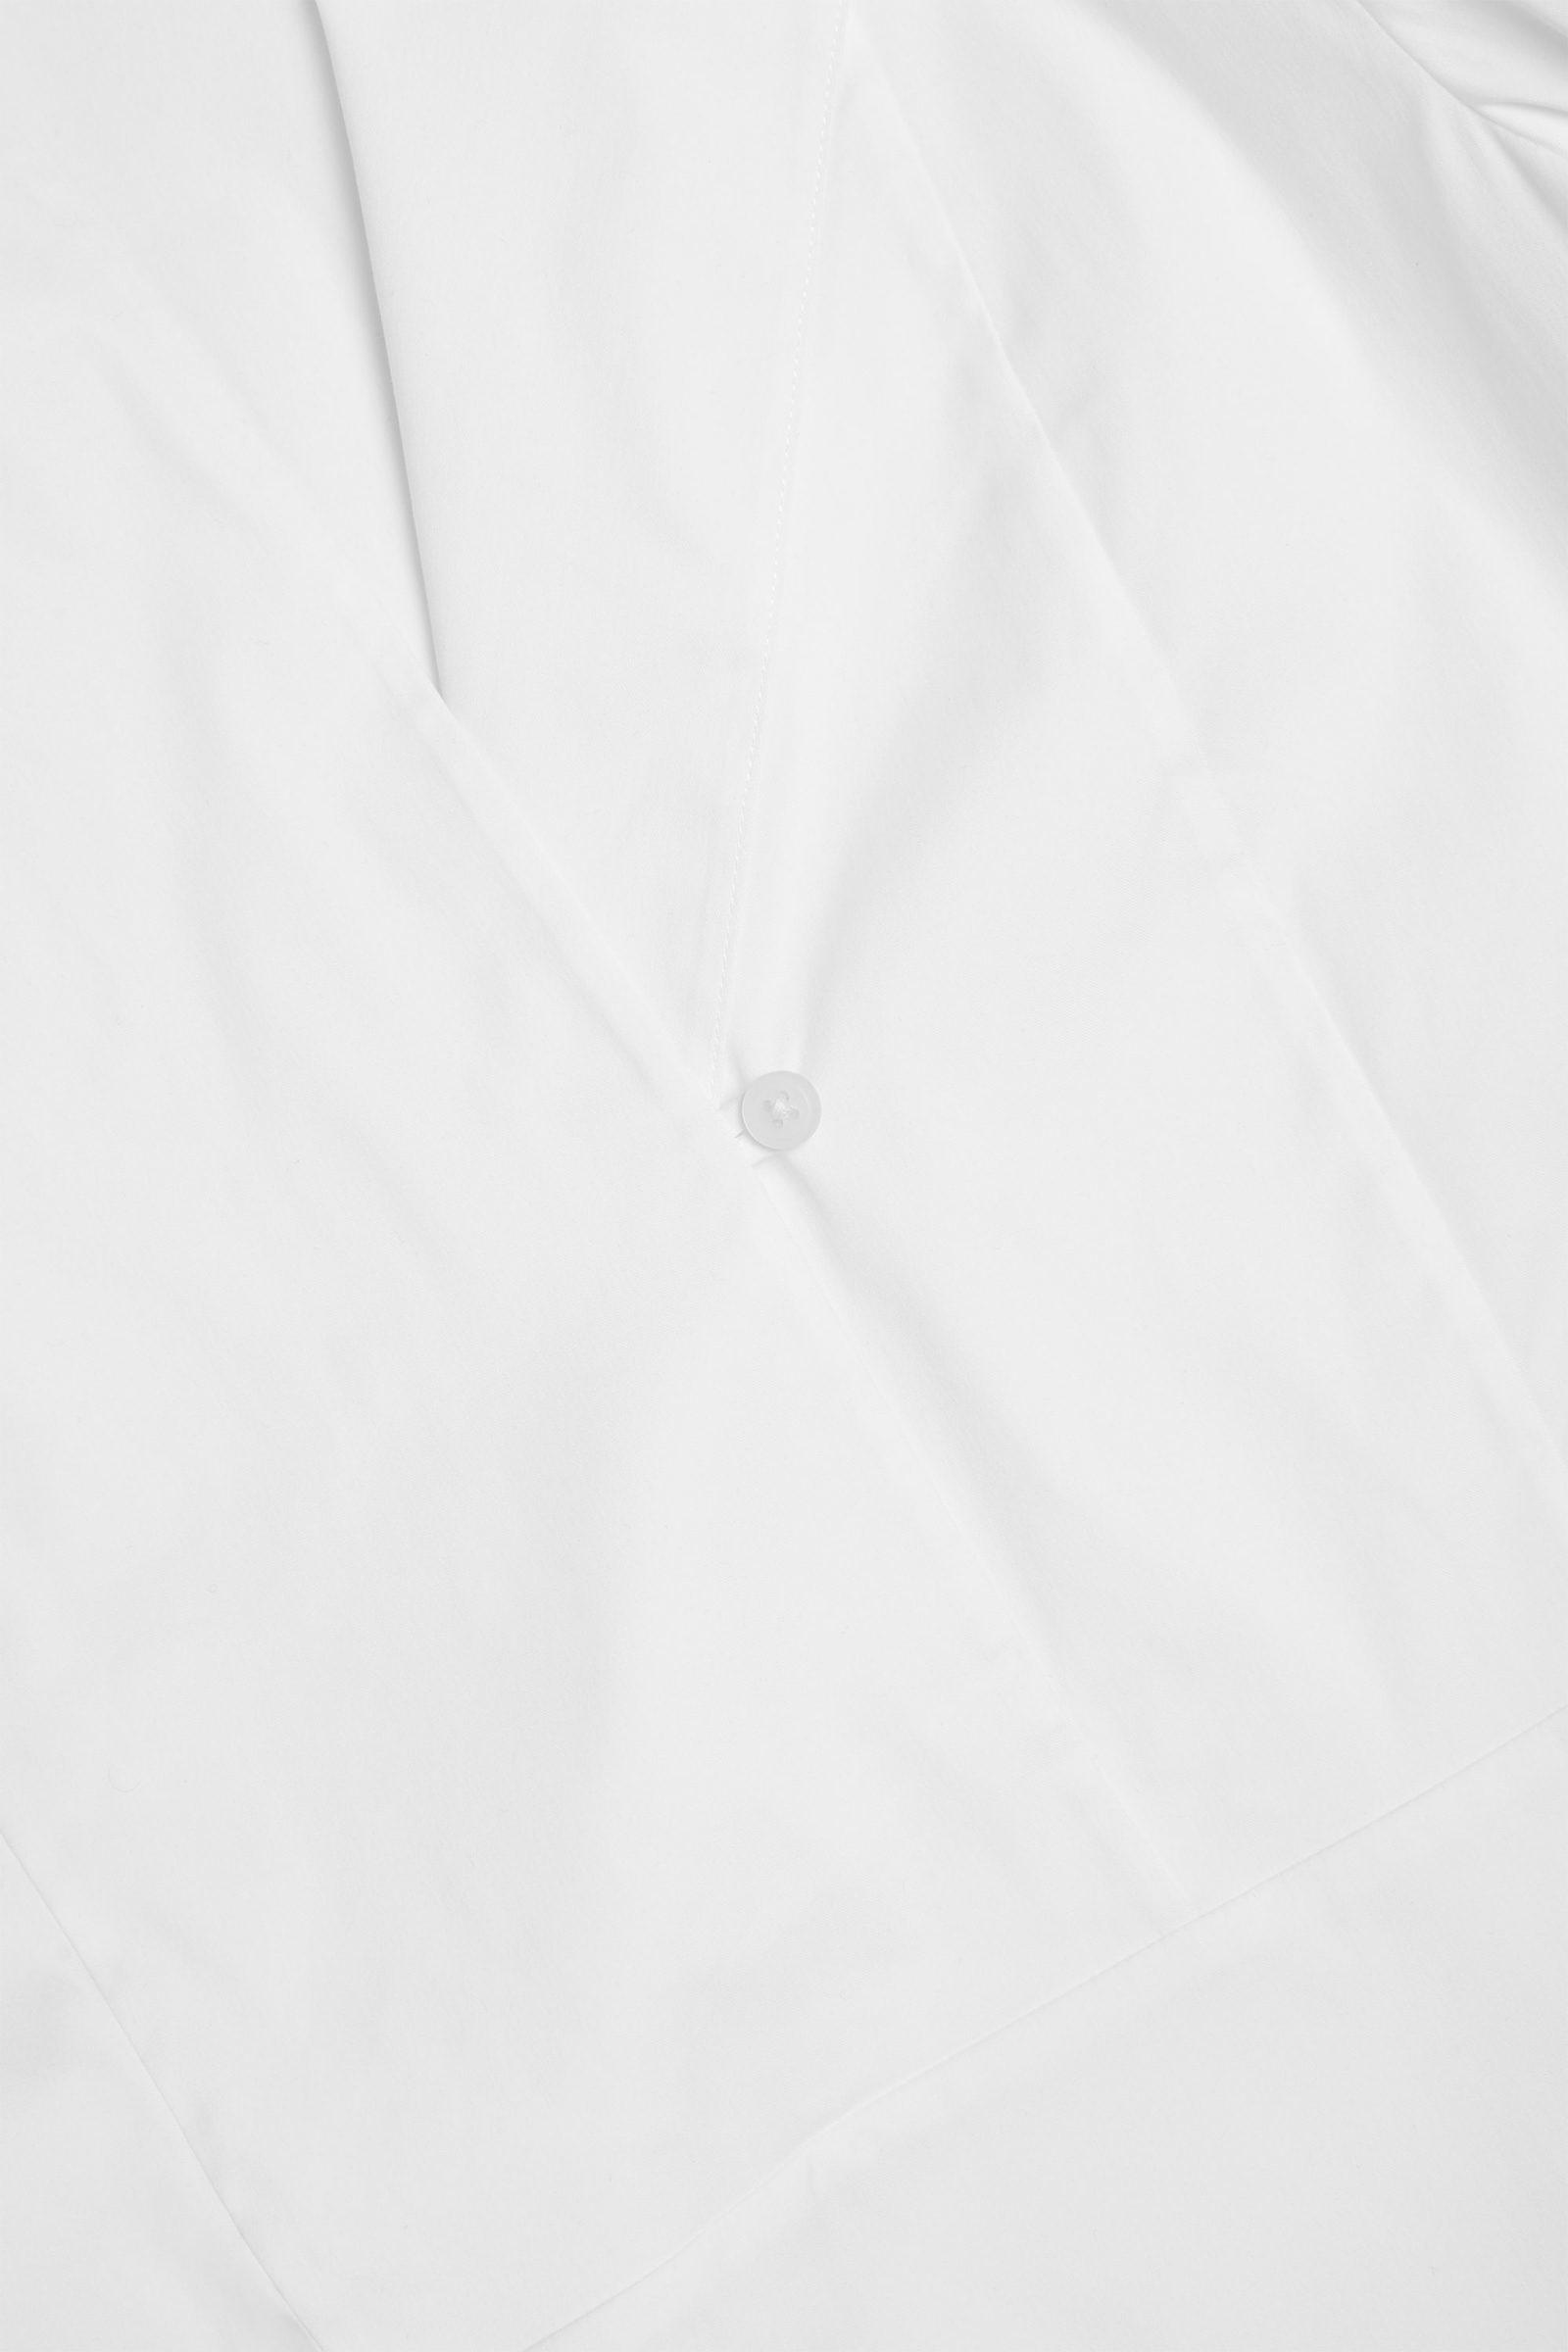 COS 오가닉 코튼 빕 디테일 셔츠의 화이트컬러 Detail입니다.